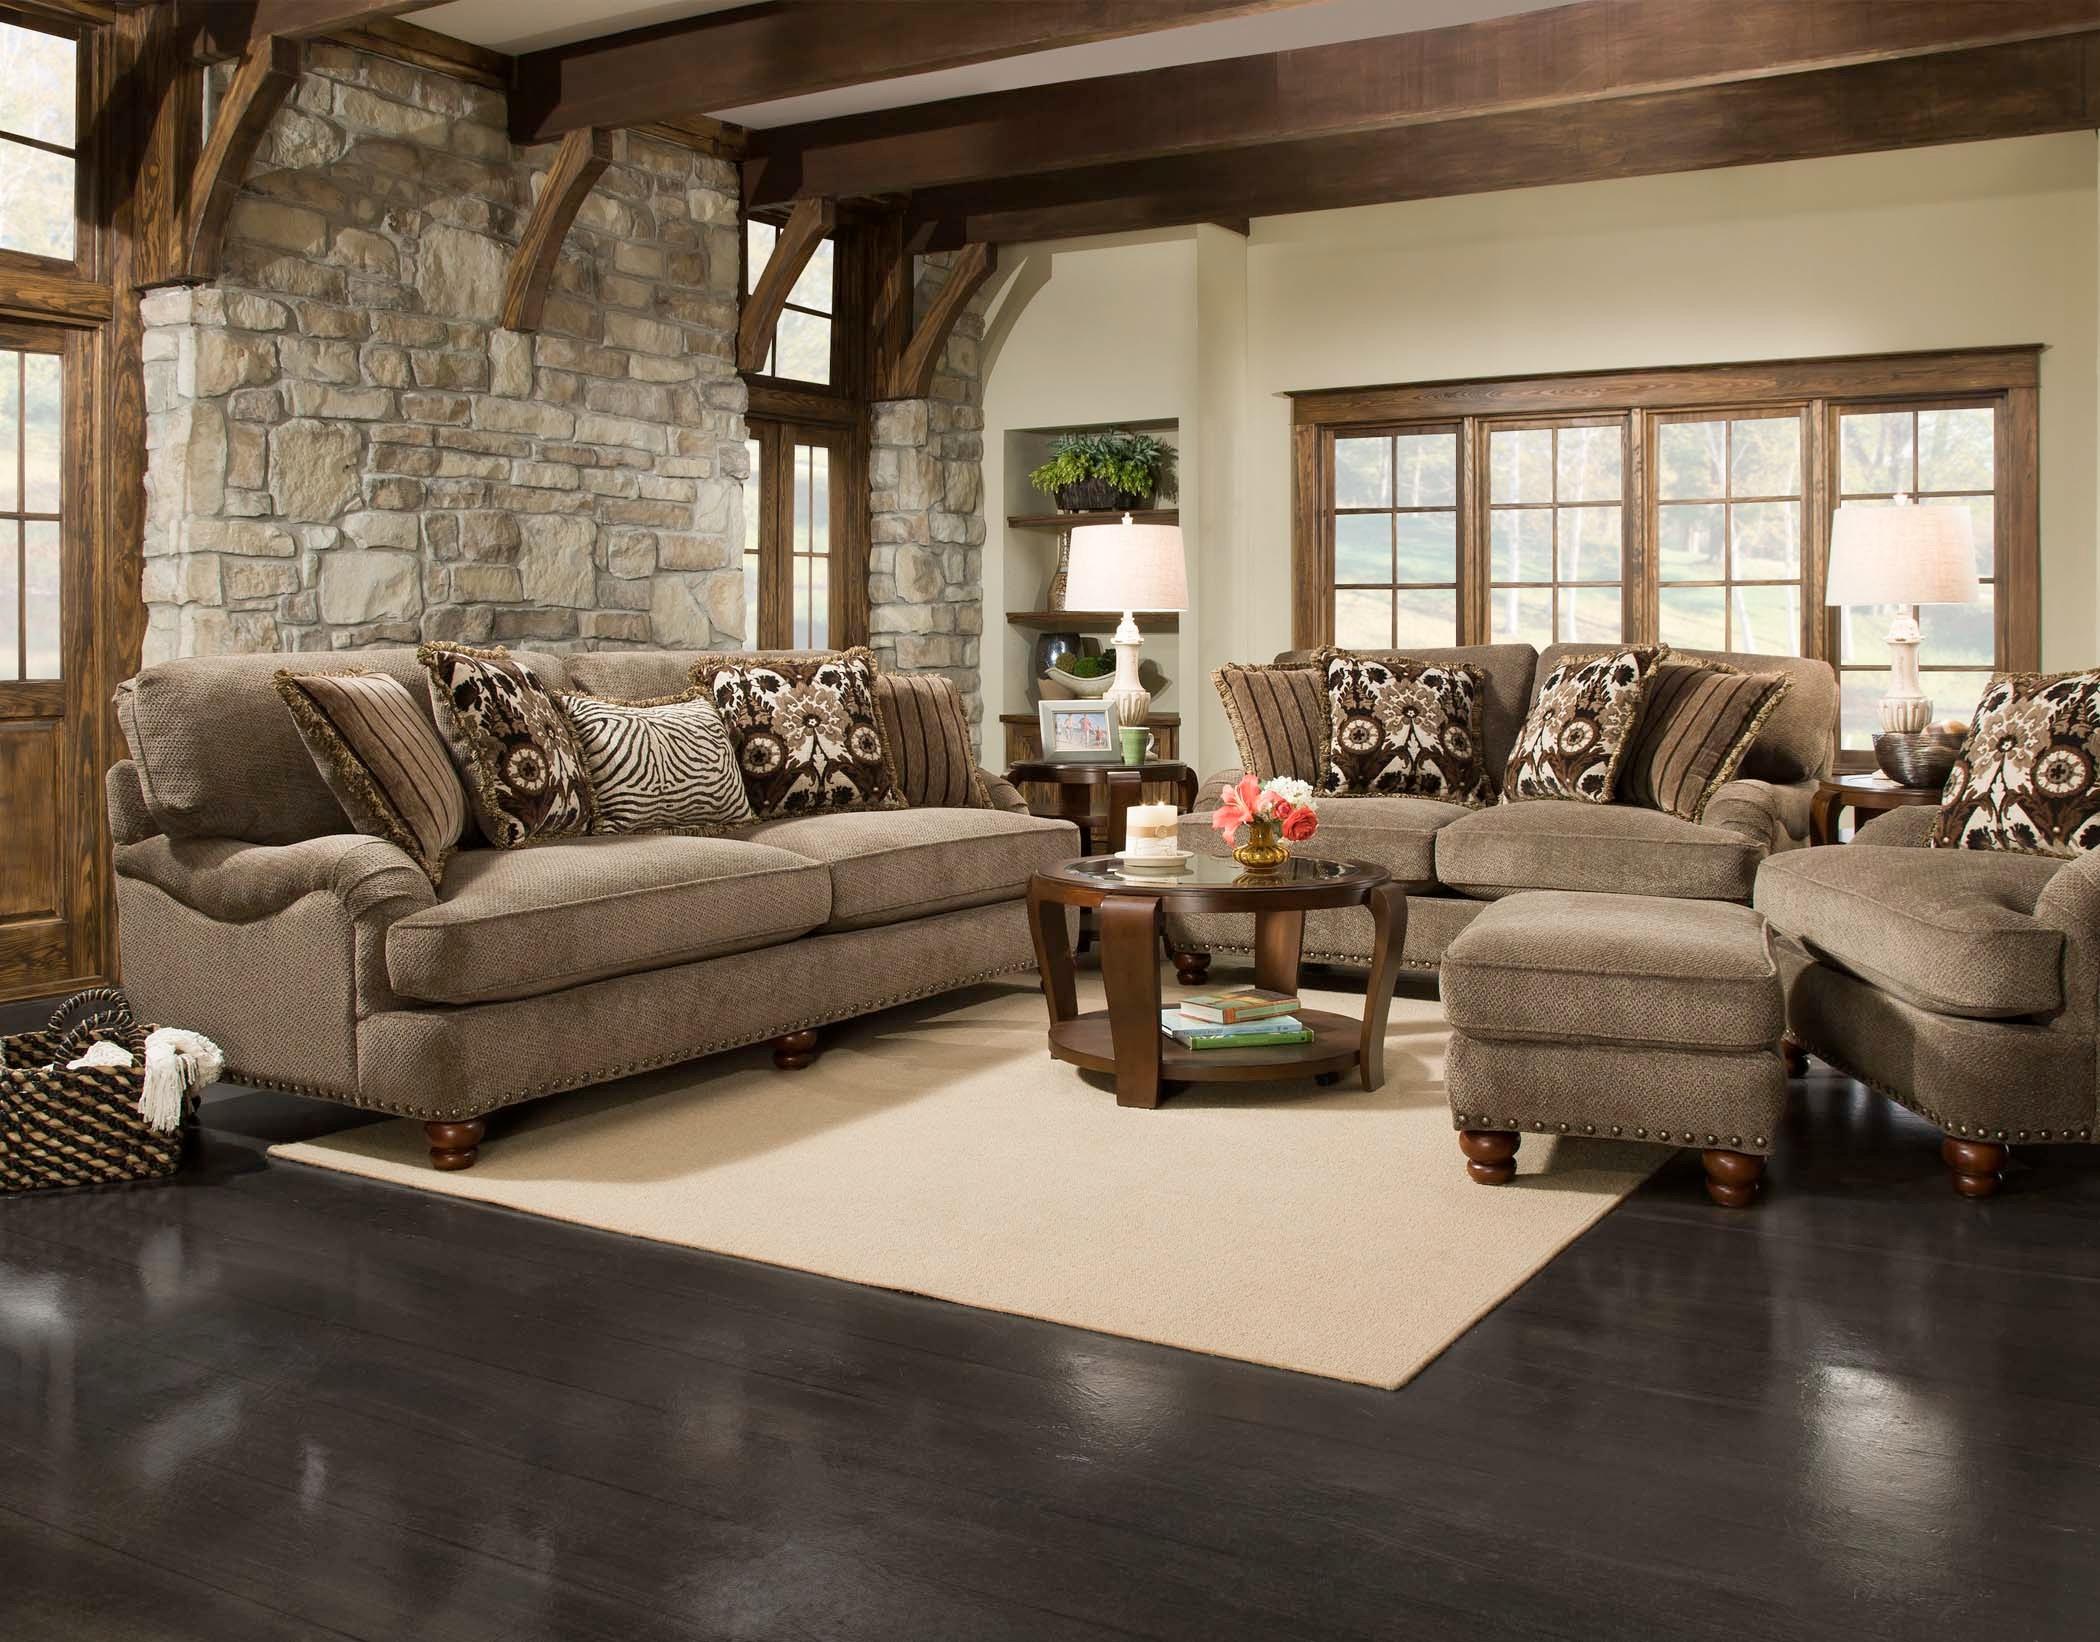 Corinthian Sofa On At Elgin Furniture S In Euclid